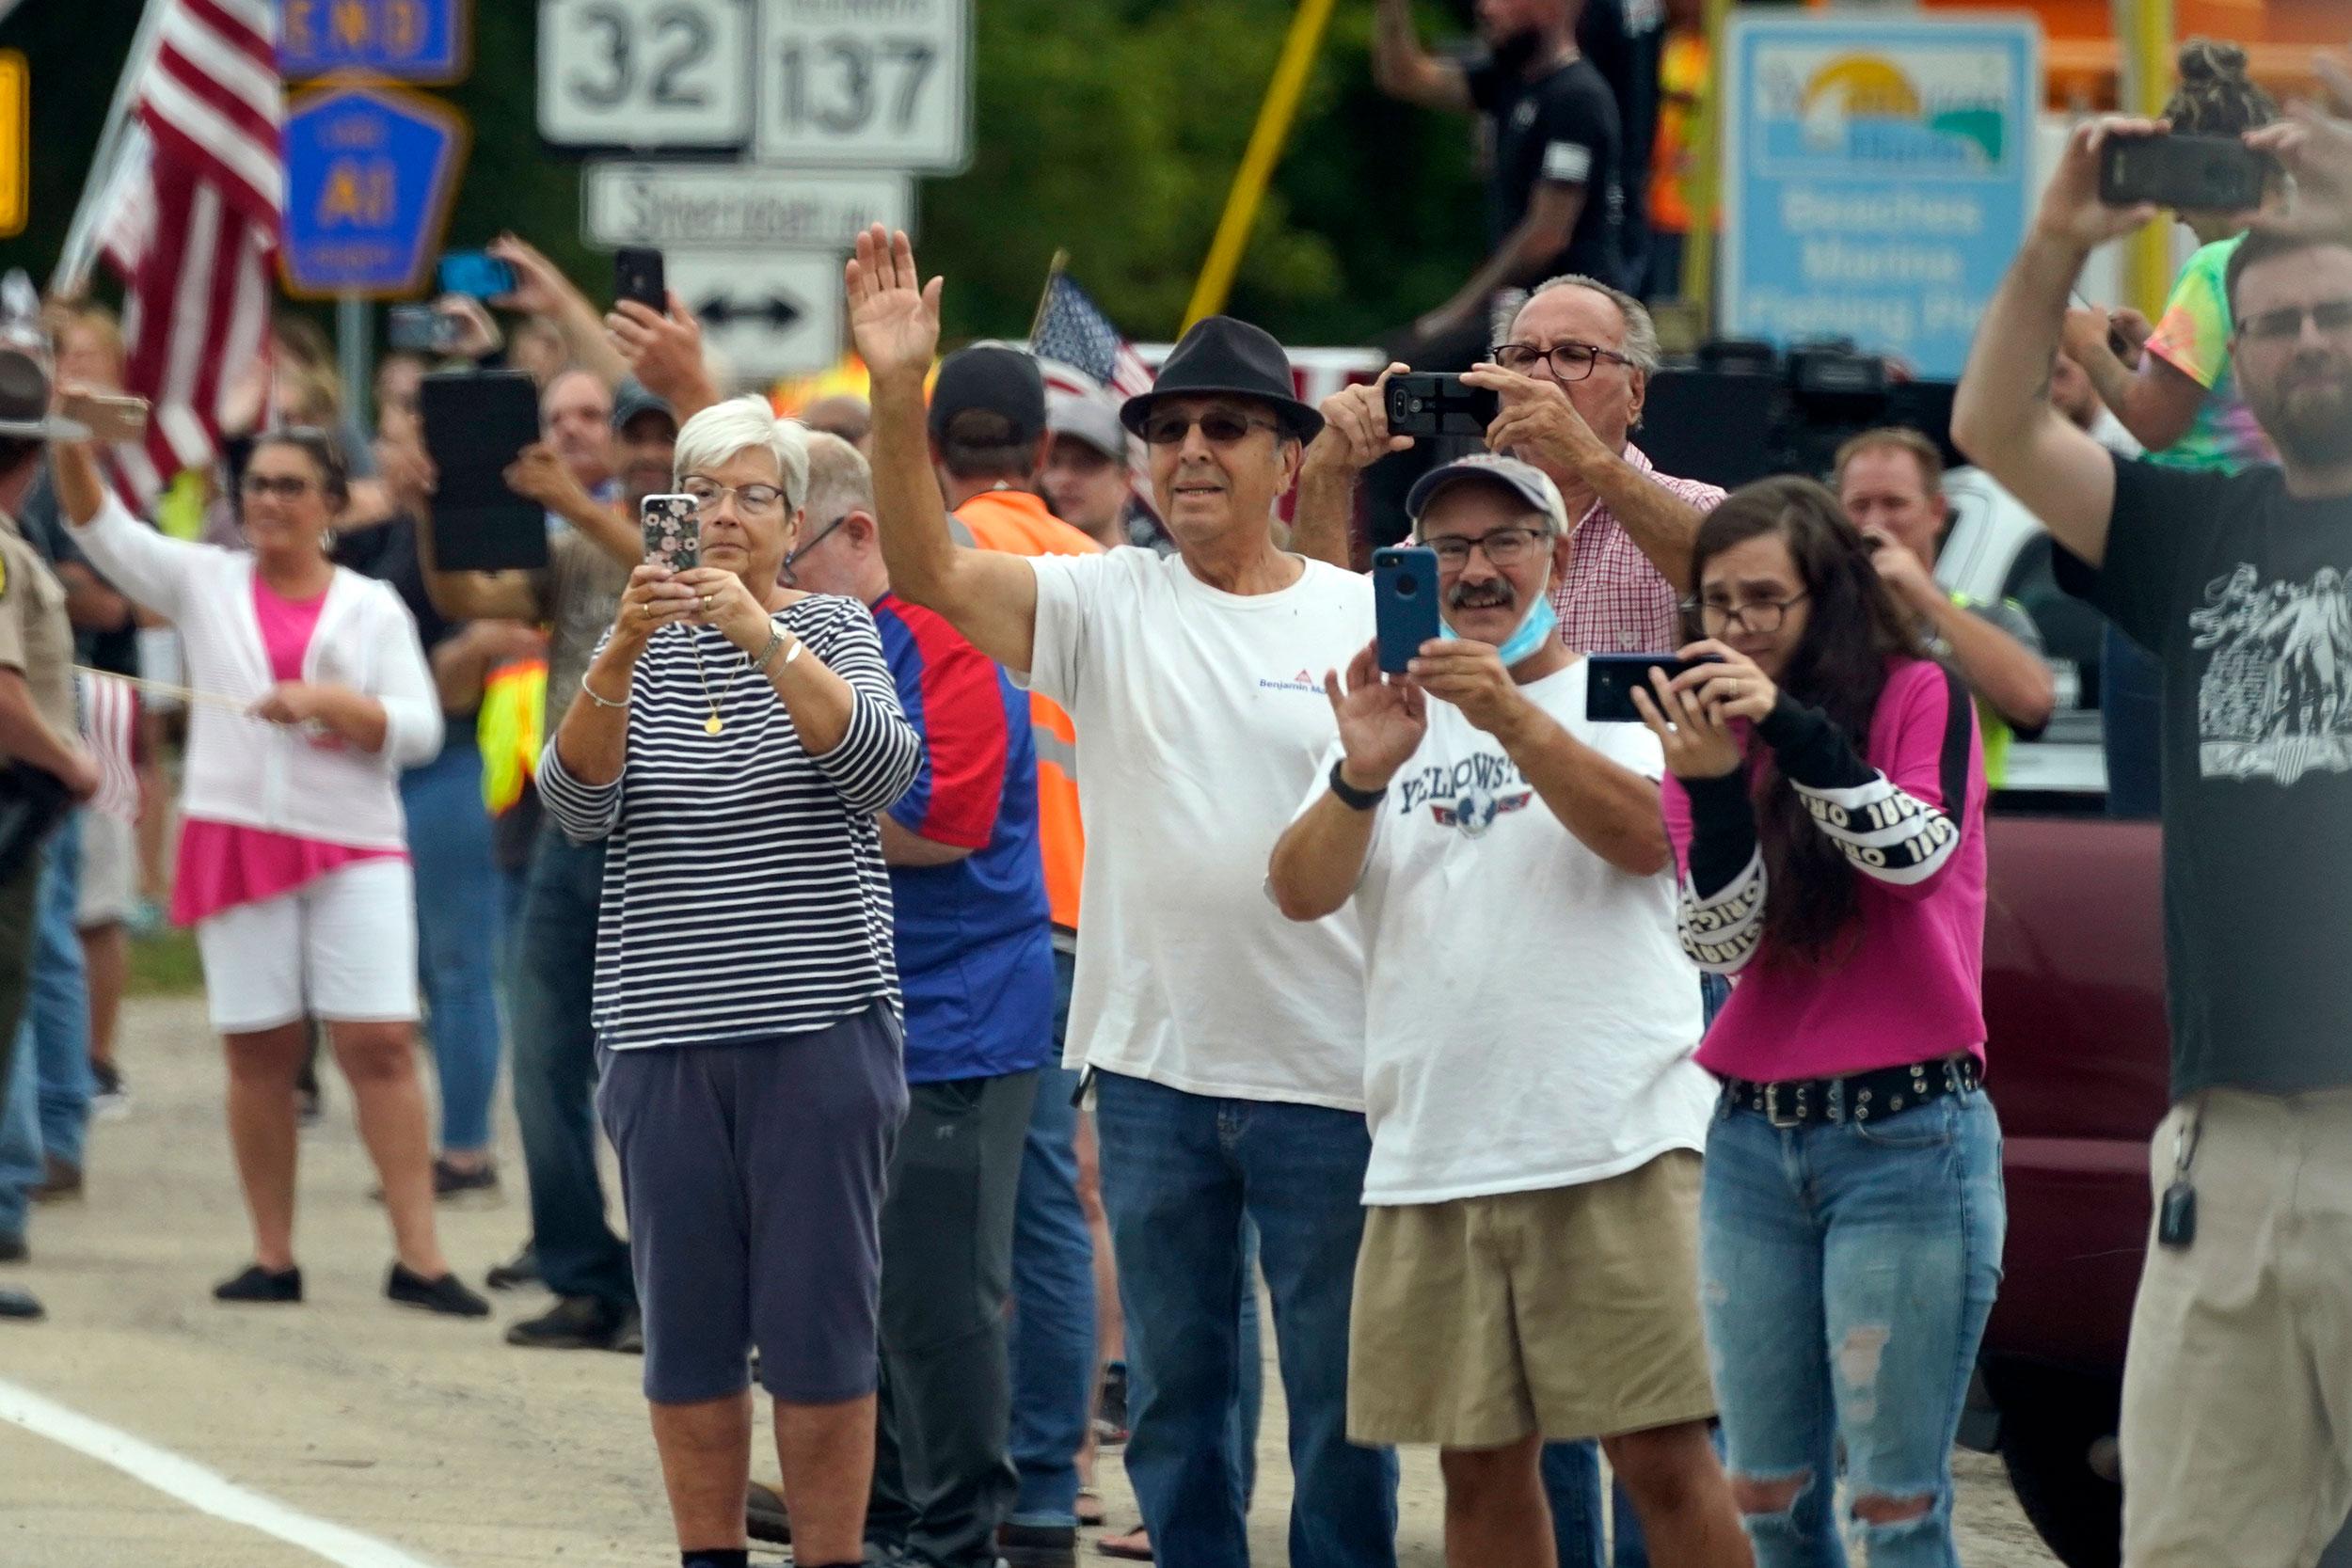 People wave at President Trump's motorcade in Kenosha on September 1.